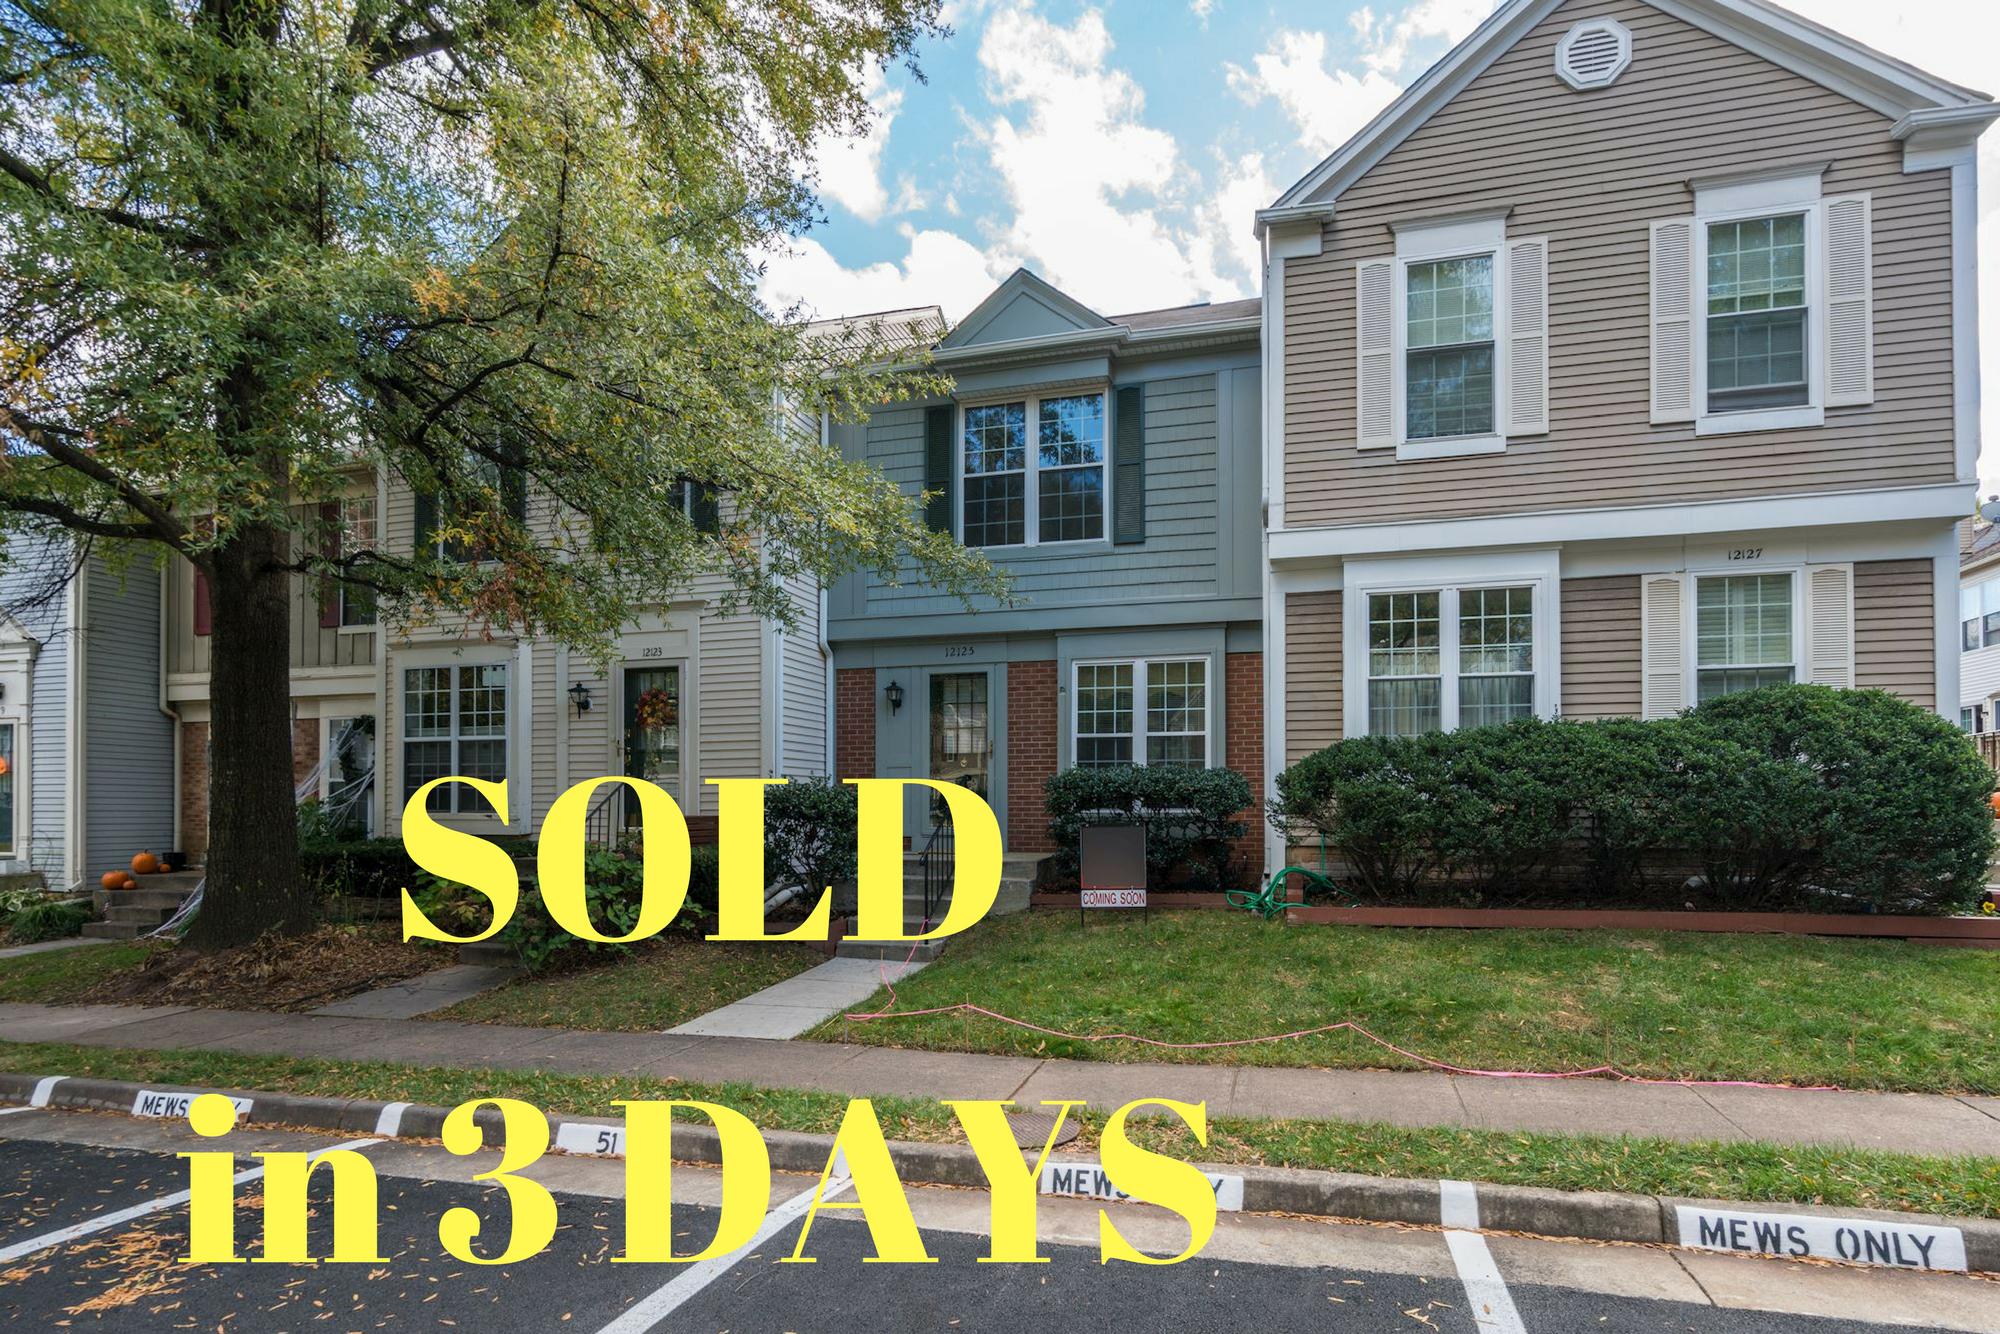 Penderbrook Fairfax VA homes for sale